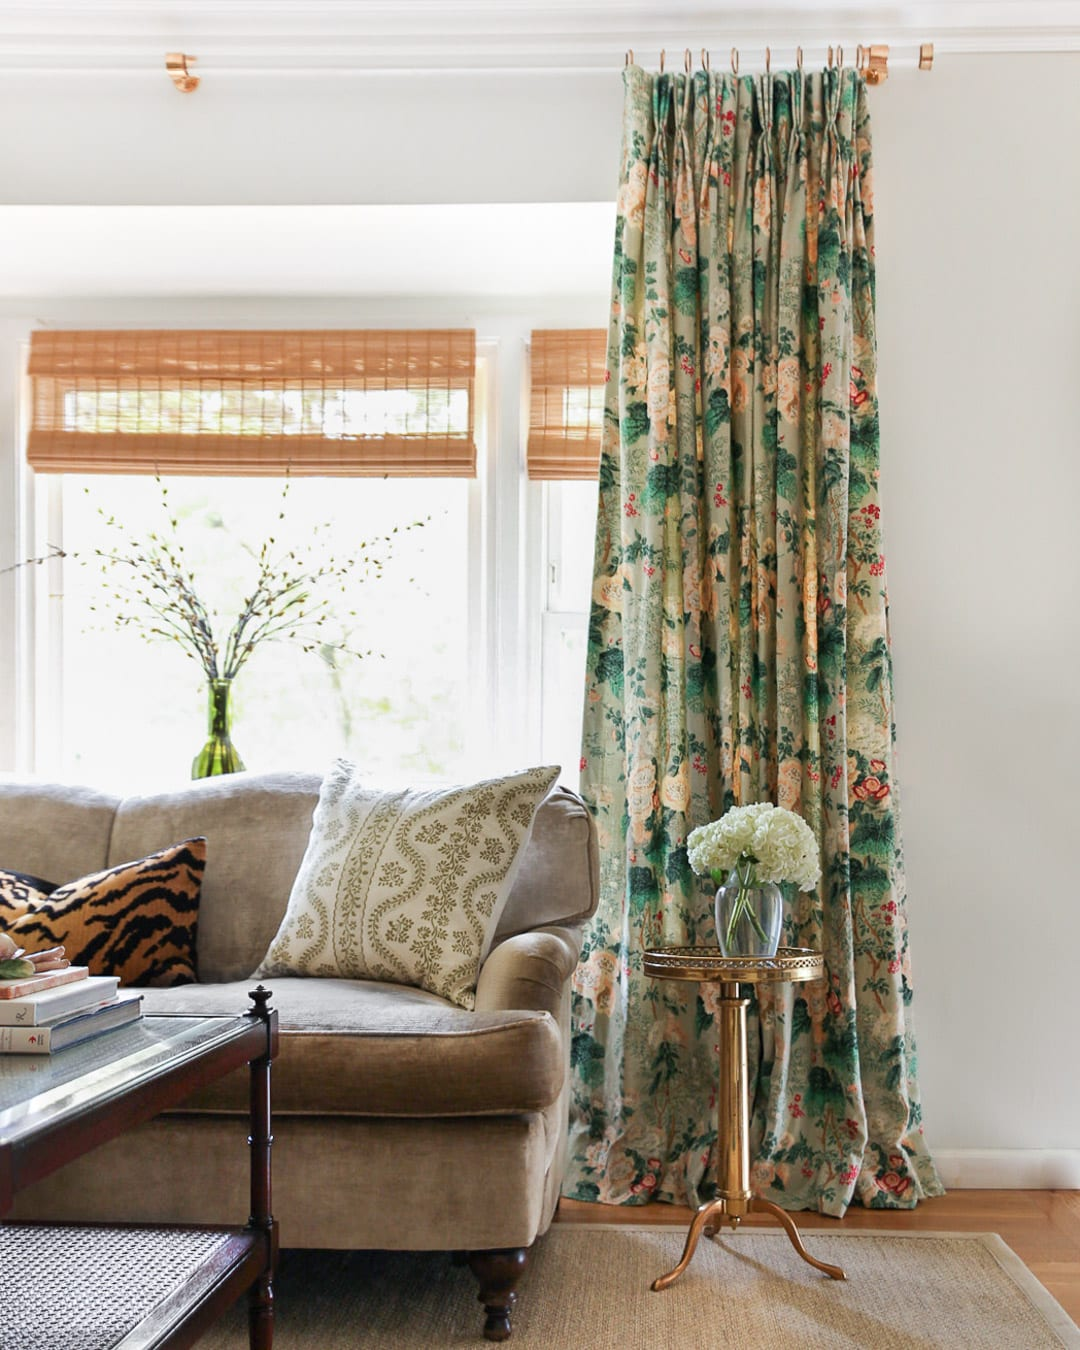 living-room-design-ideas-curtains-white-walls